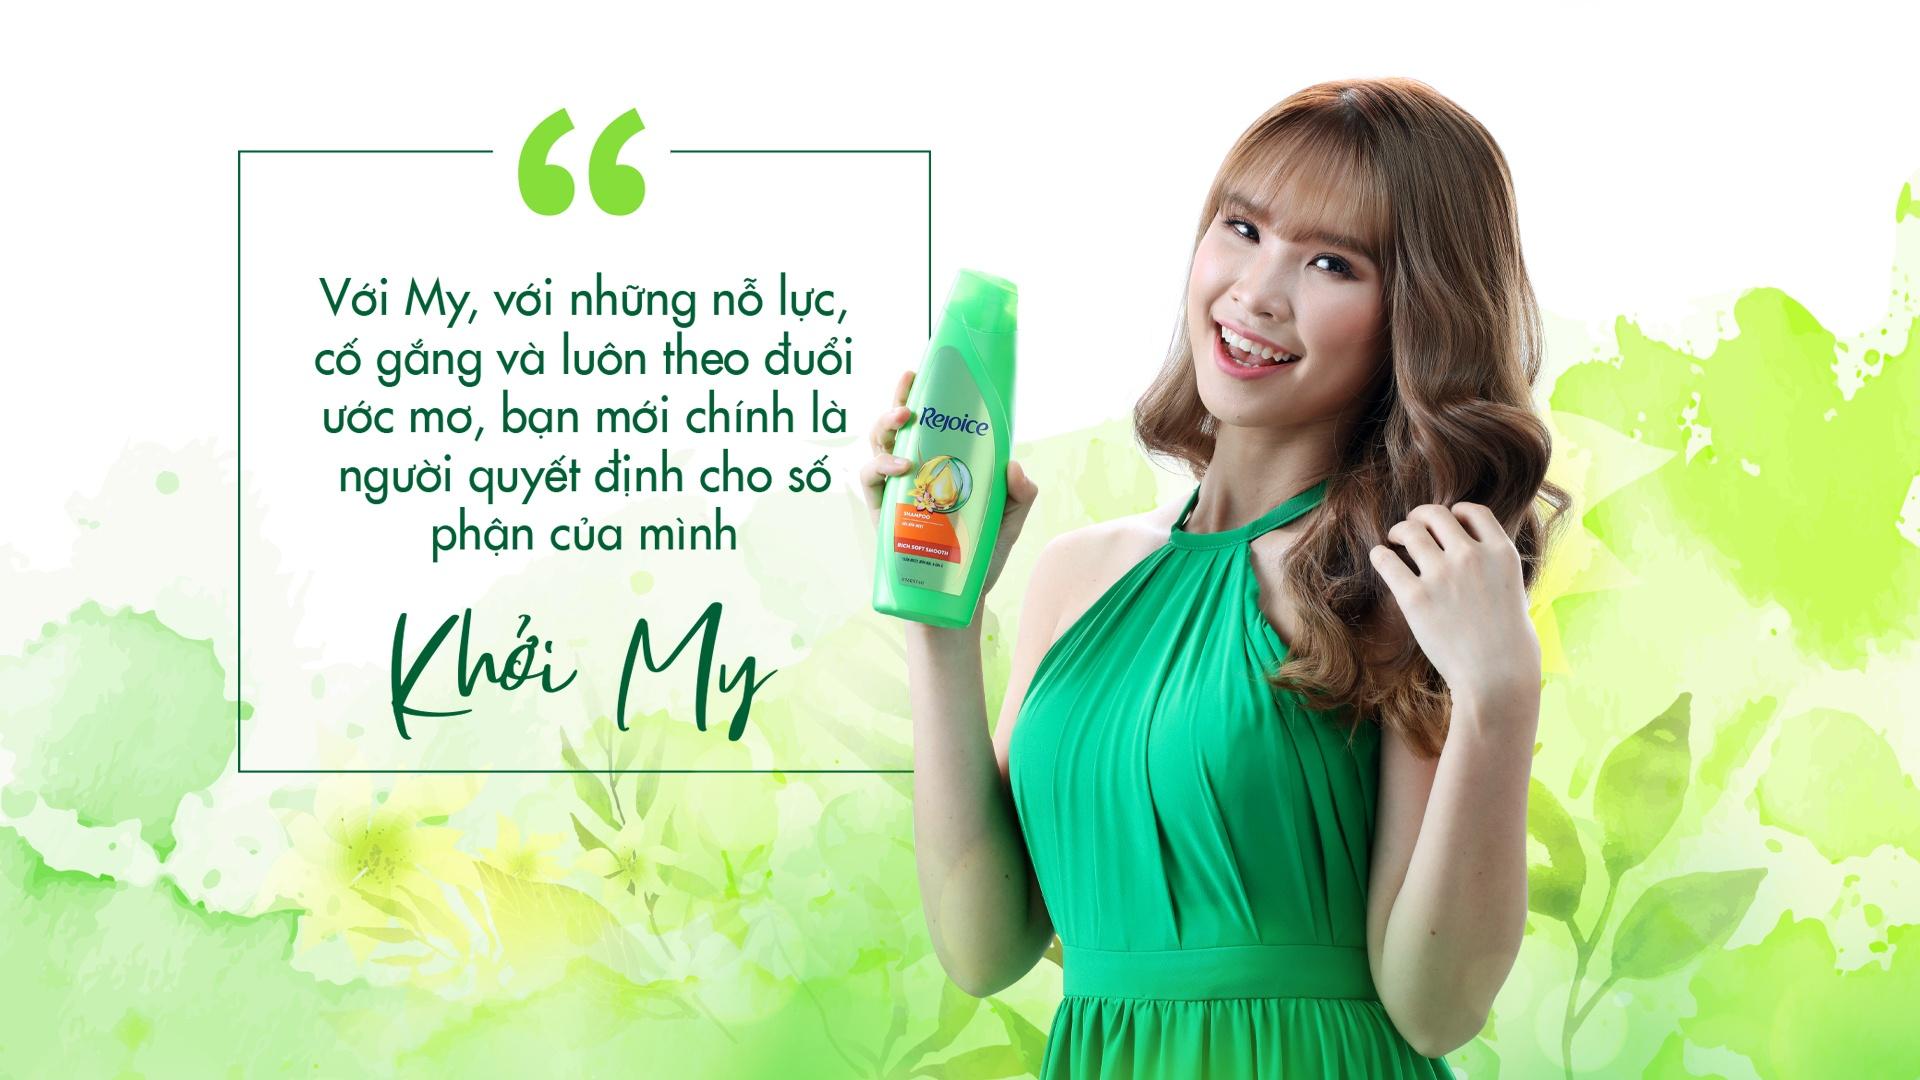 Khoi My - 'hong nhan muot phan' cua showbiz Viet hinh anh 11